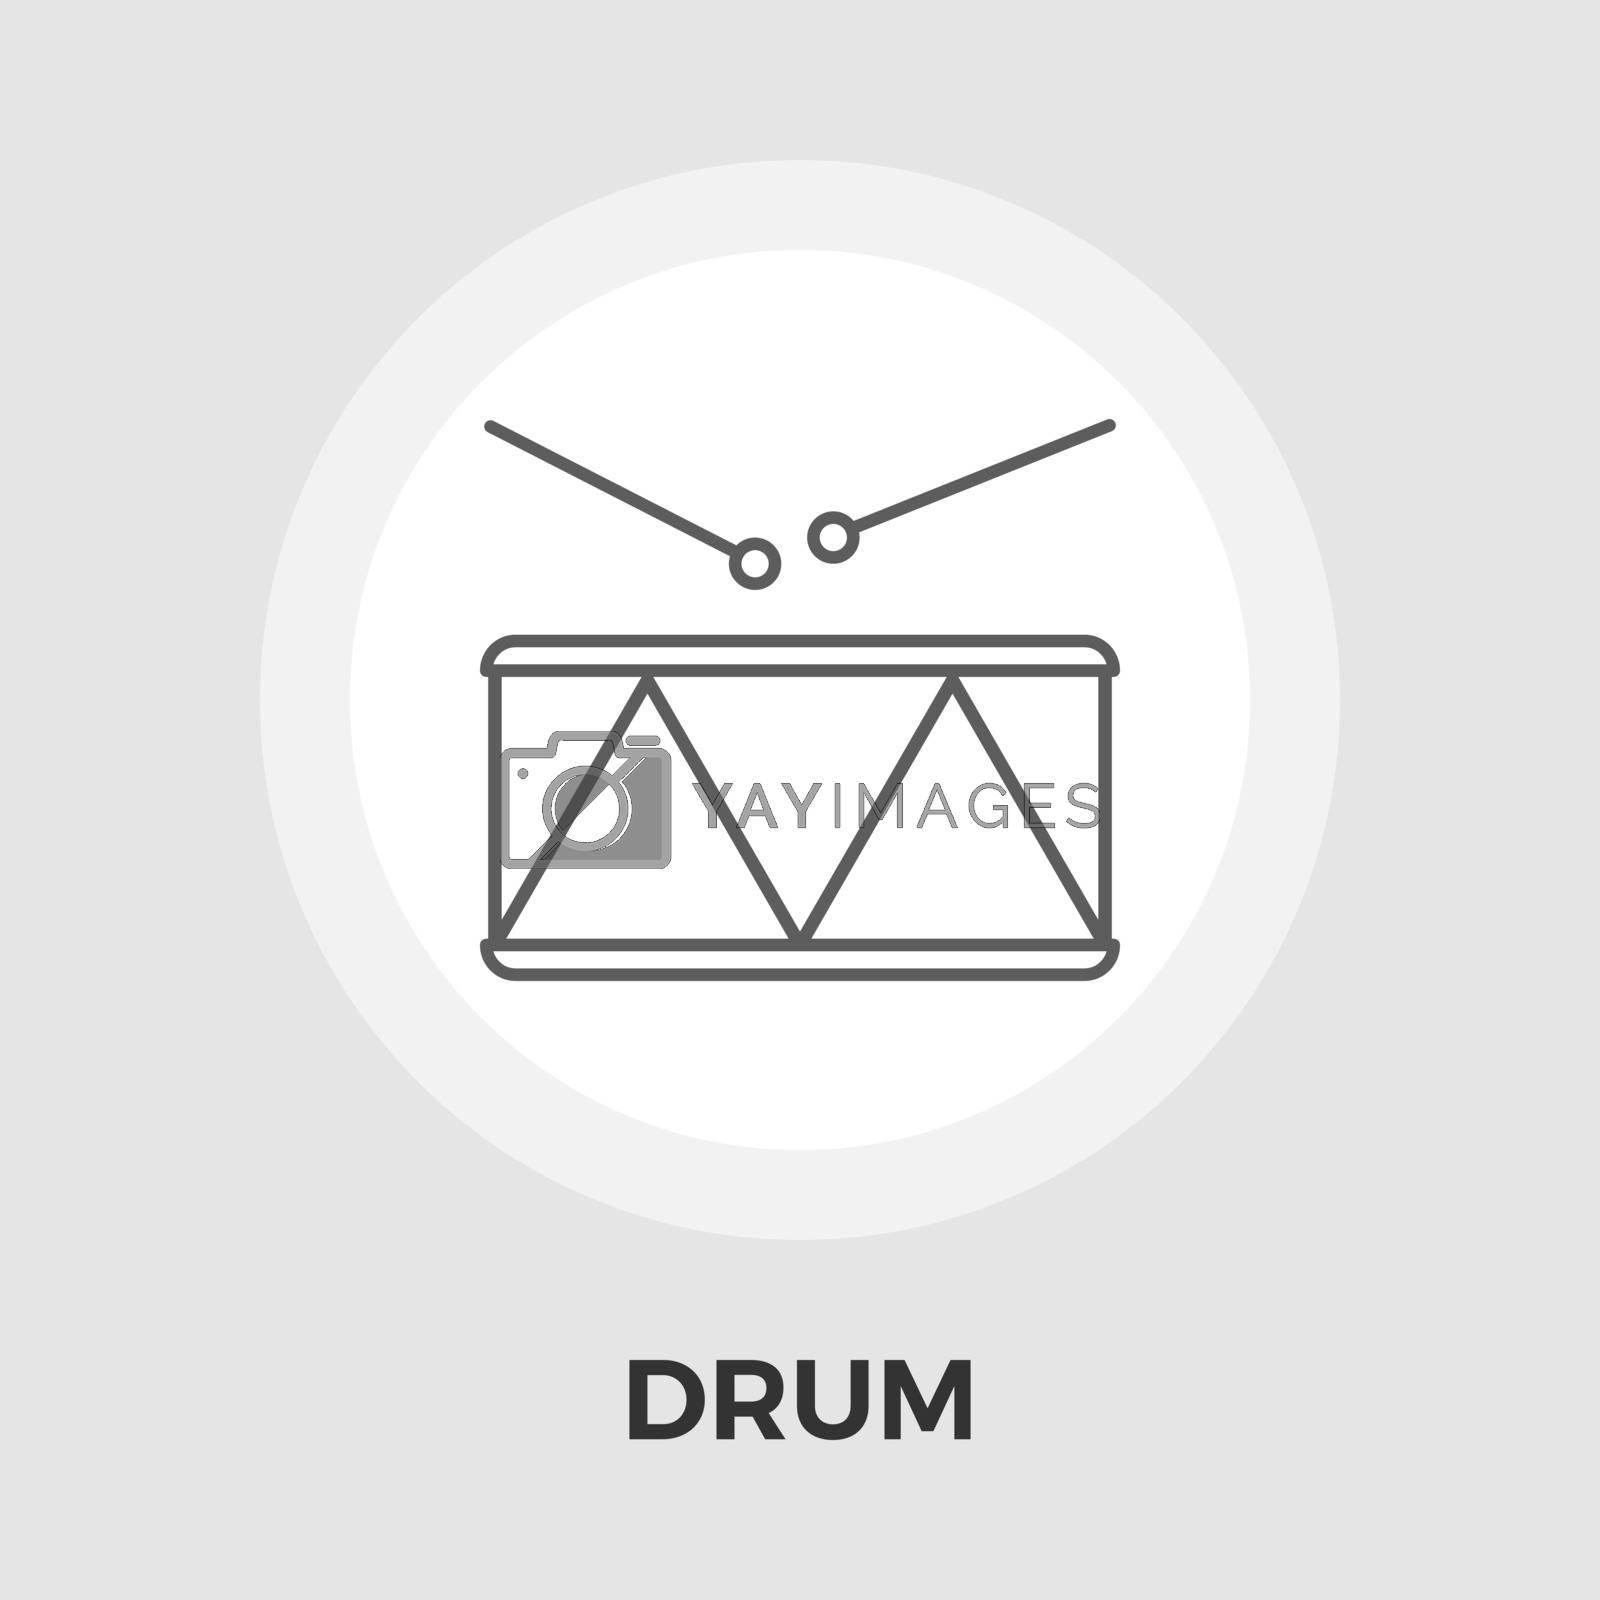 Drum vector flat icon by smoki